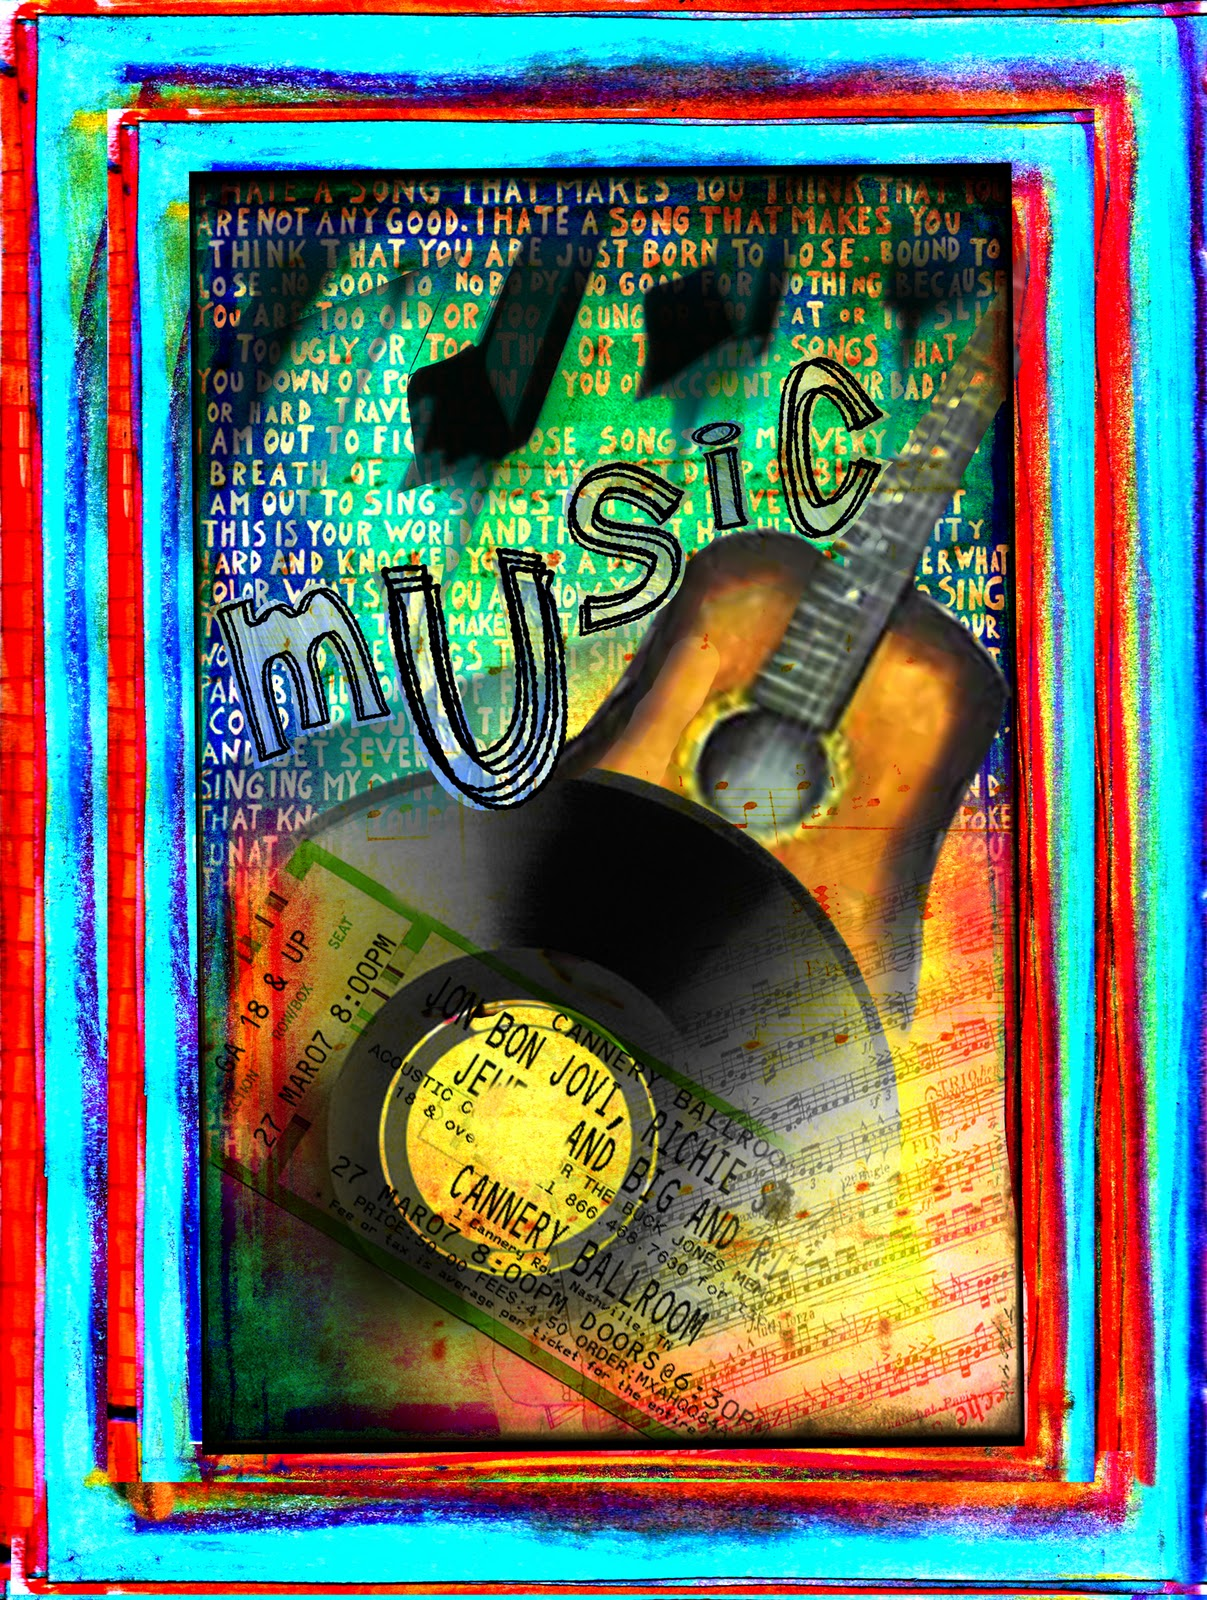 Life E Vivere Soundtrack Of My Life